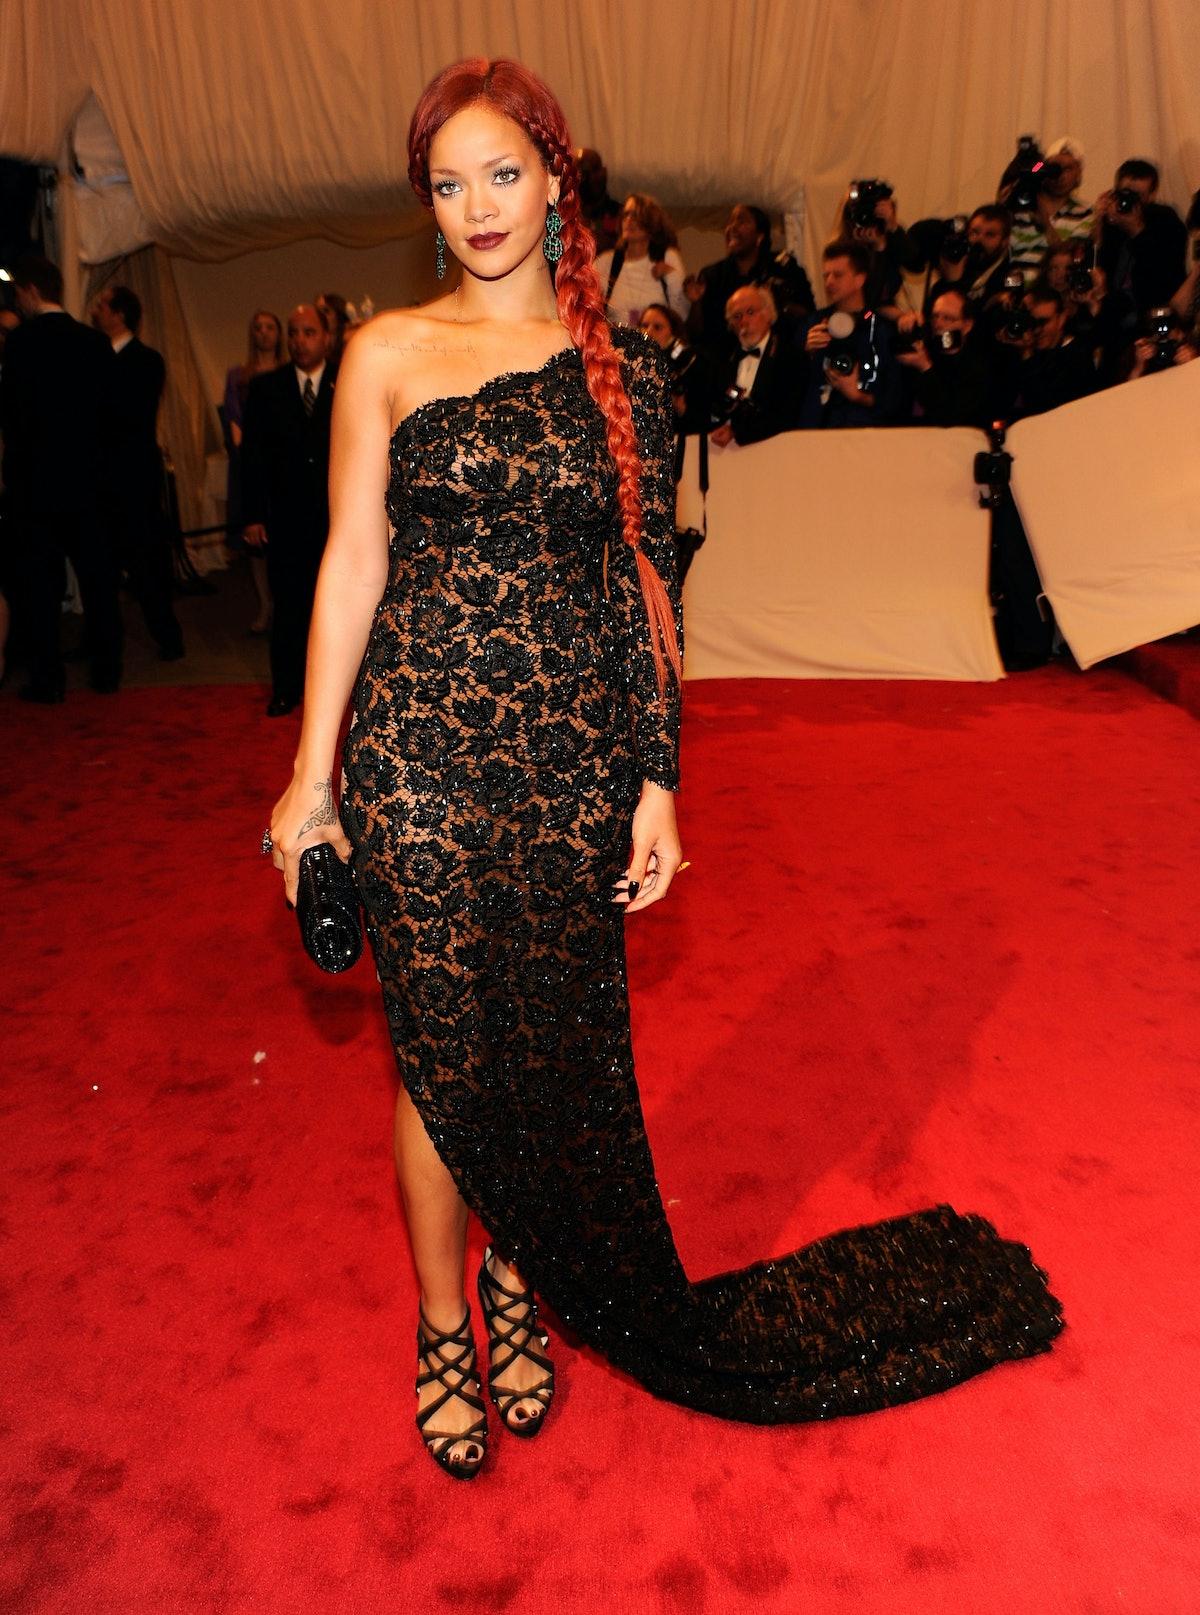 Rihanna in lace dress